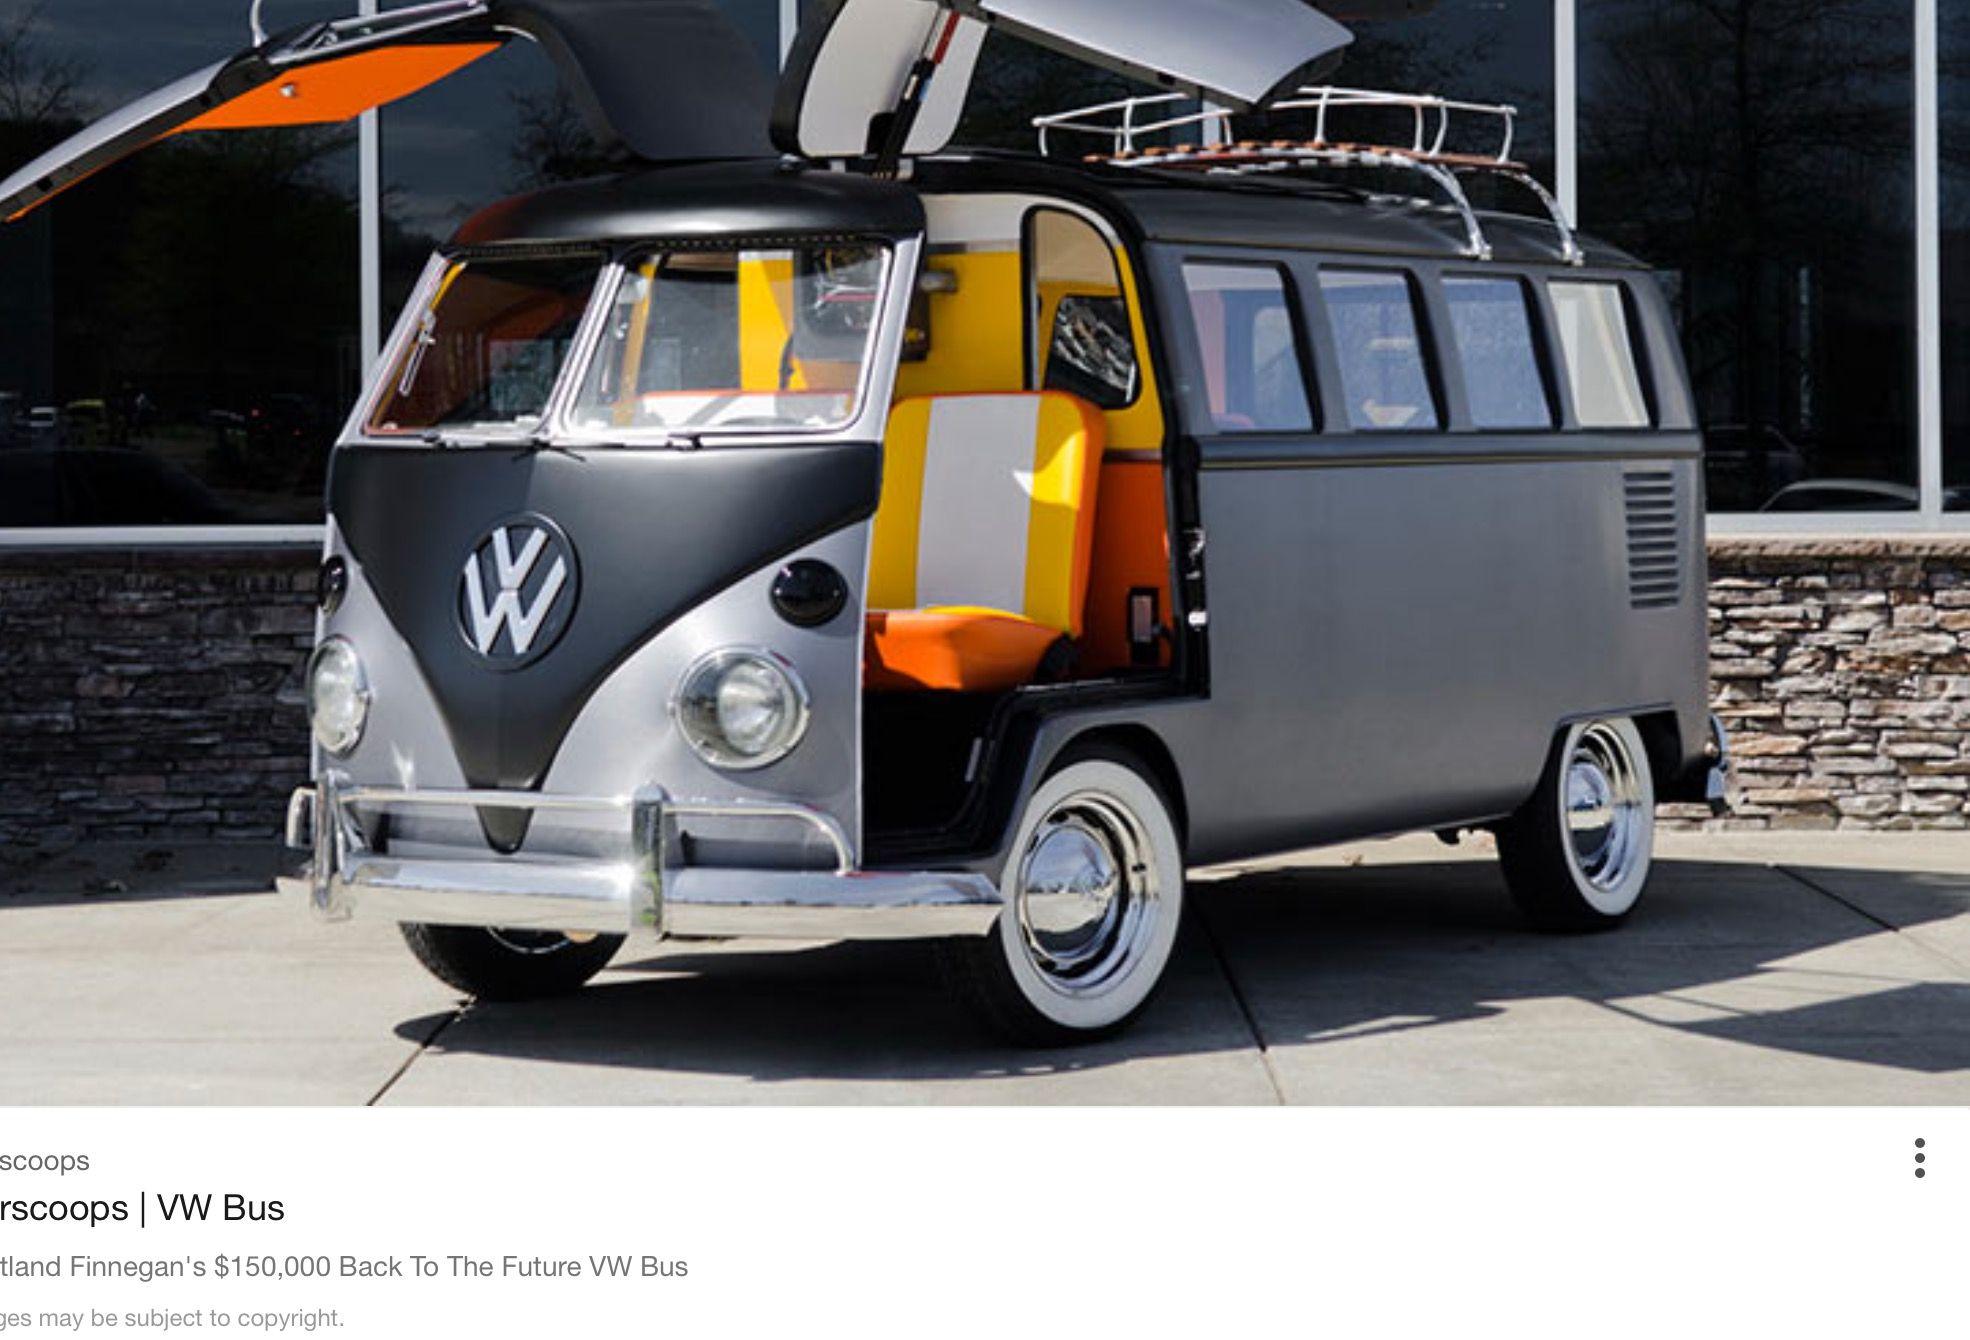 tag bus driven volkswagen img transporter wp vw van camper